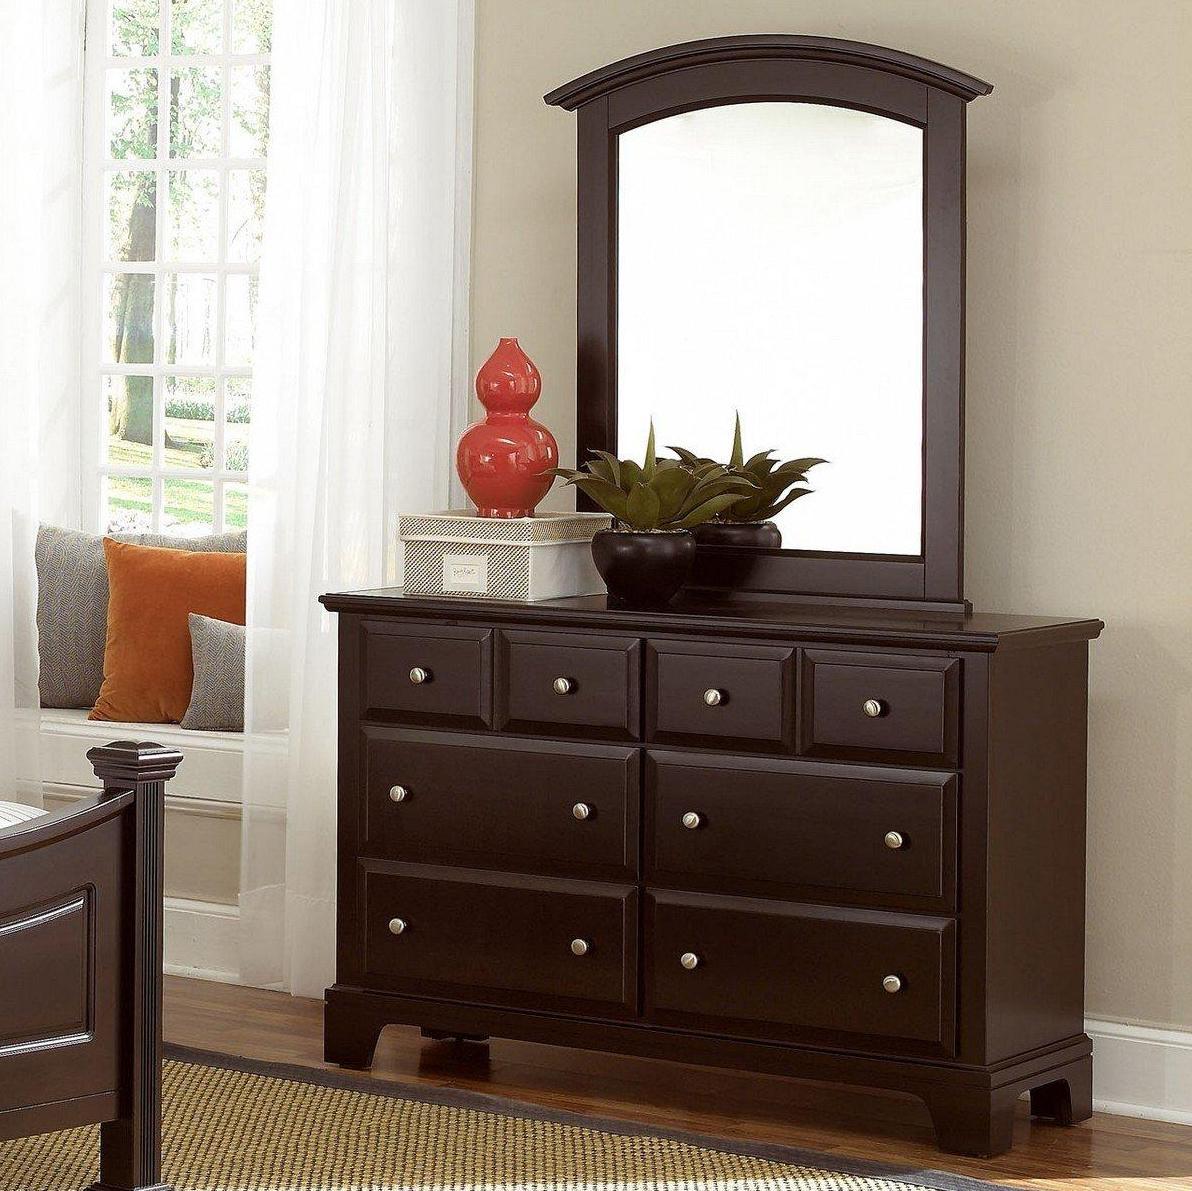 Vaughan Bassett Hamilton Dresser - 6 Drawers & Mirror - Item Number: BB4-001+442